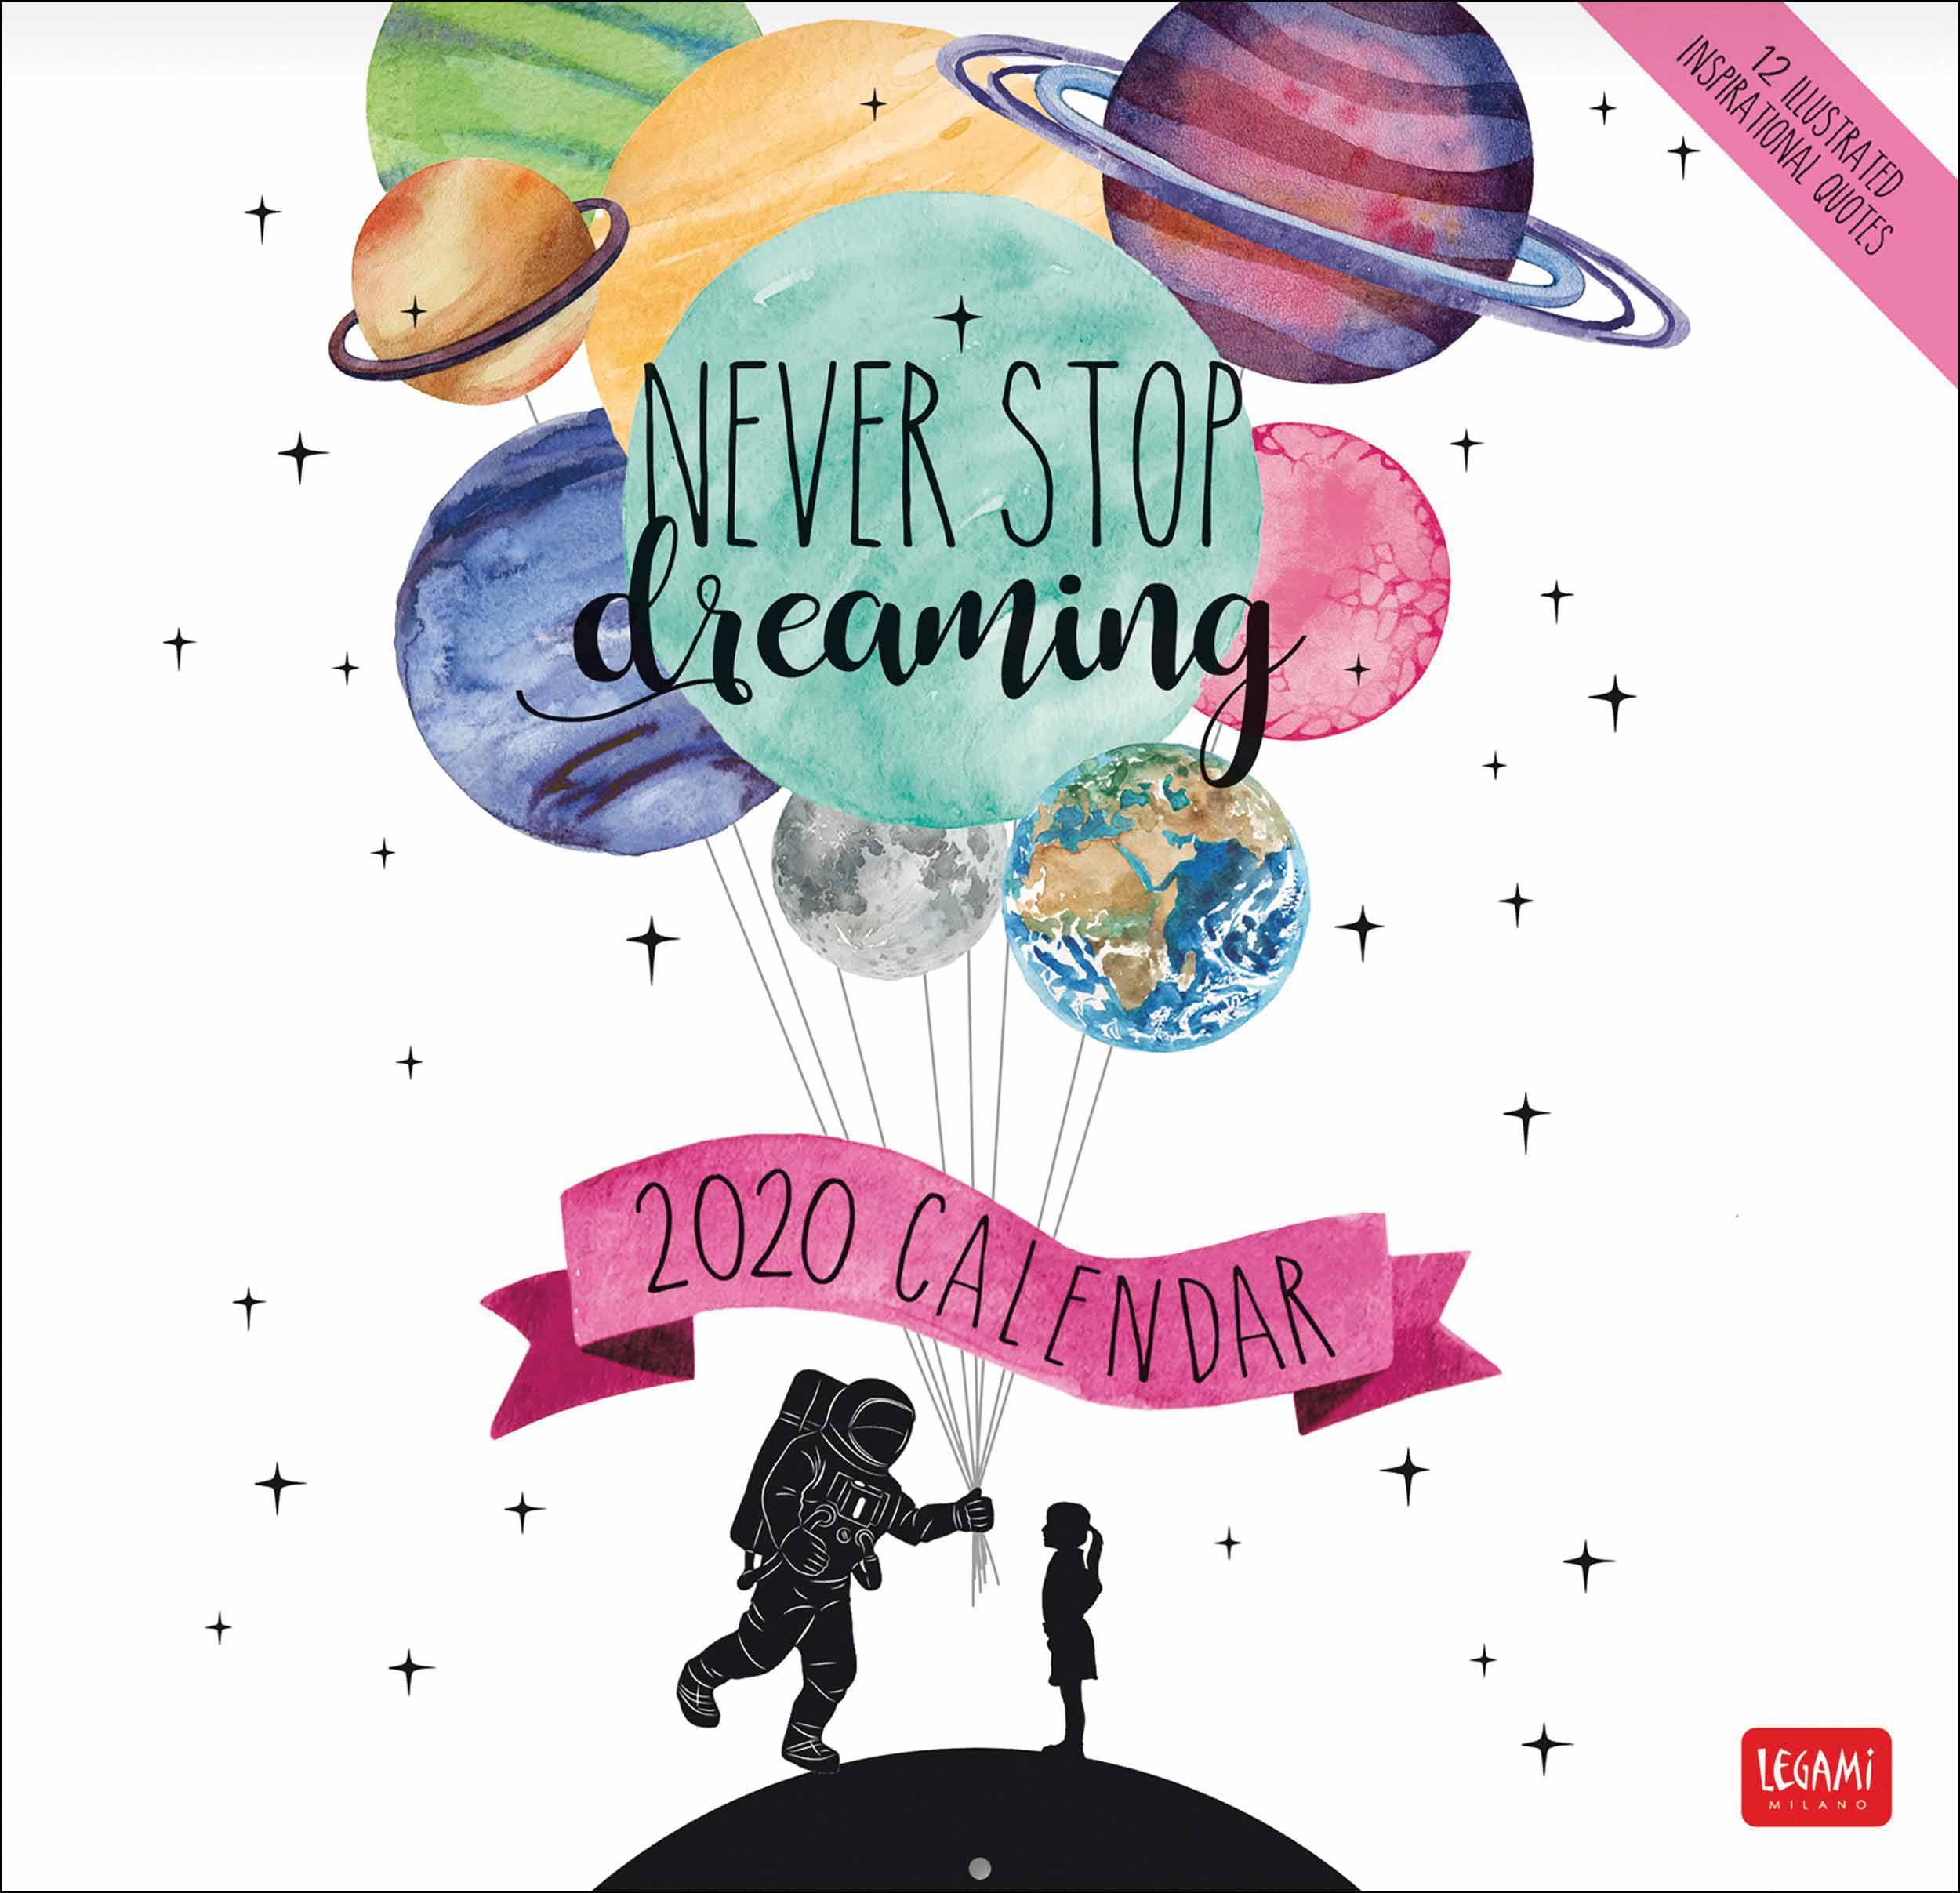 Never Stop Dreaming Calendar 2020 in Dreaming Of A Calendar Date